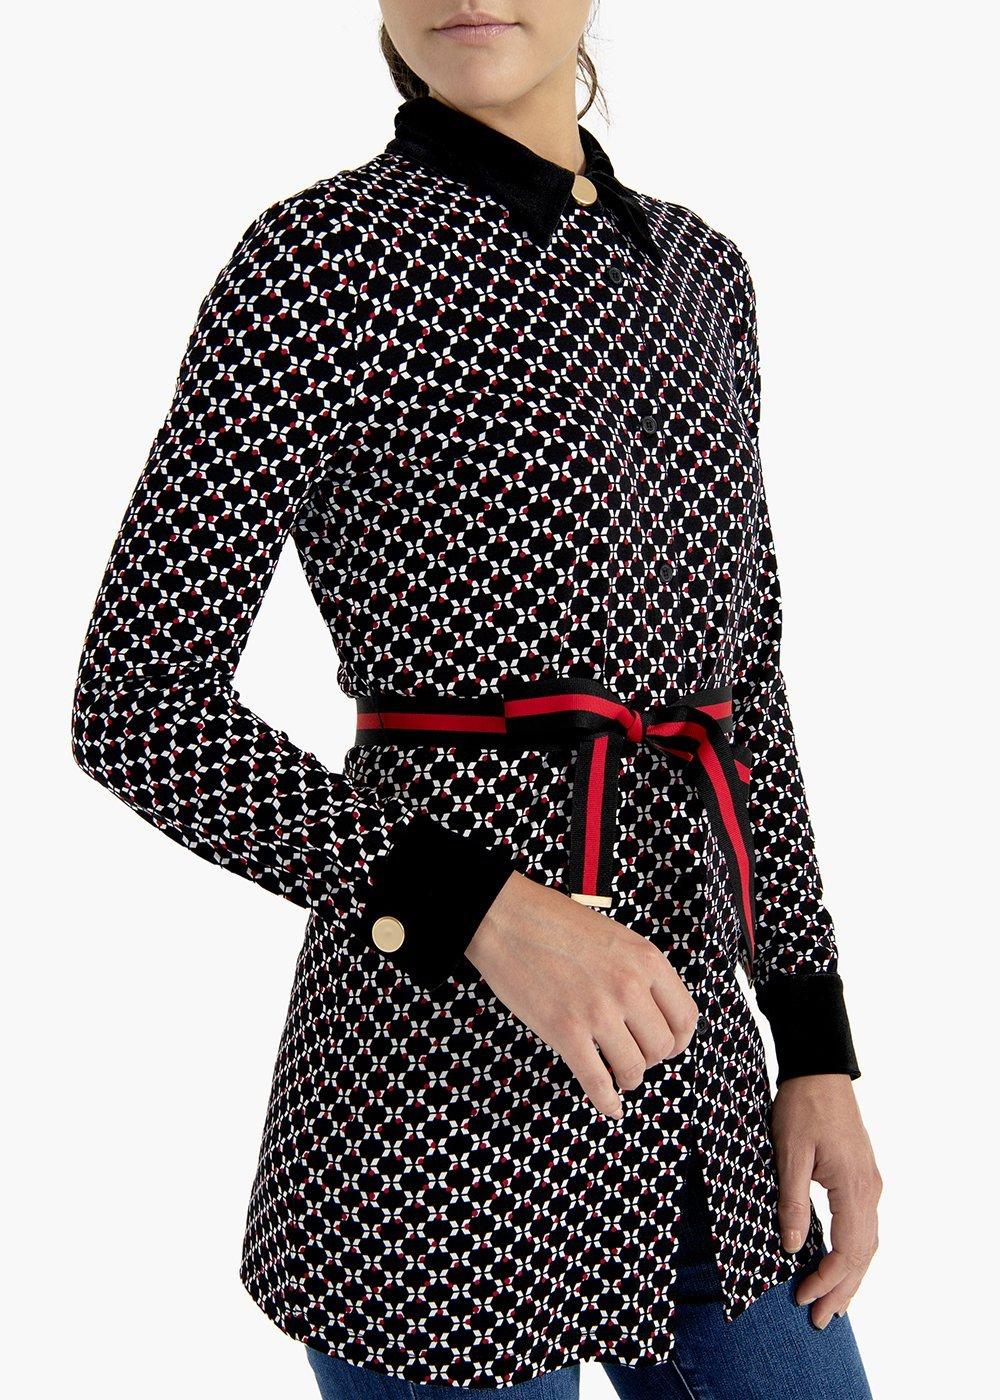 T-shirt Sabrin in micro geometric pattern viscose jersey - Black / White Fantasia - Woman